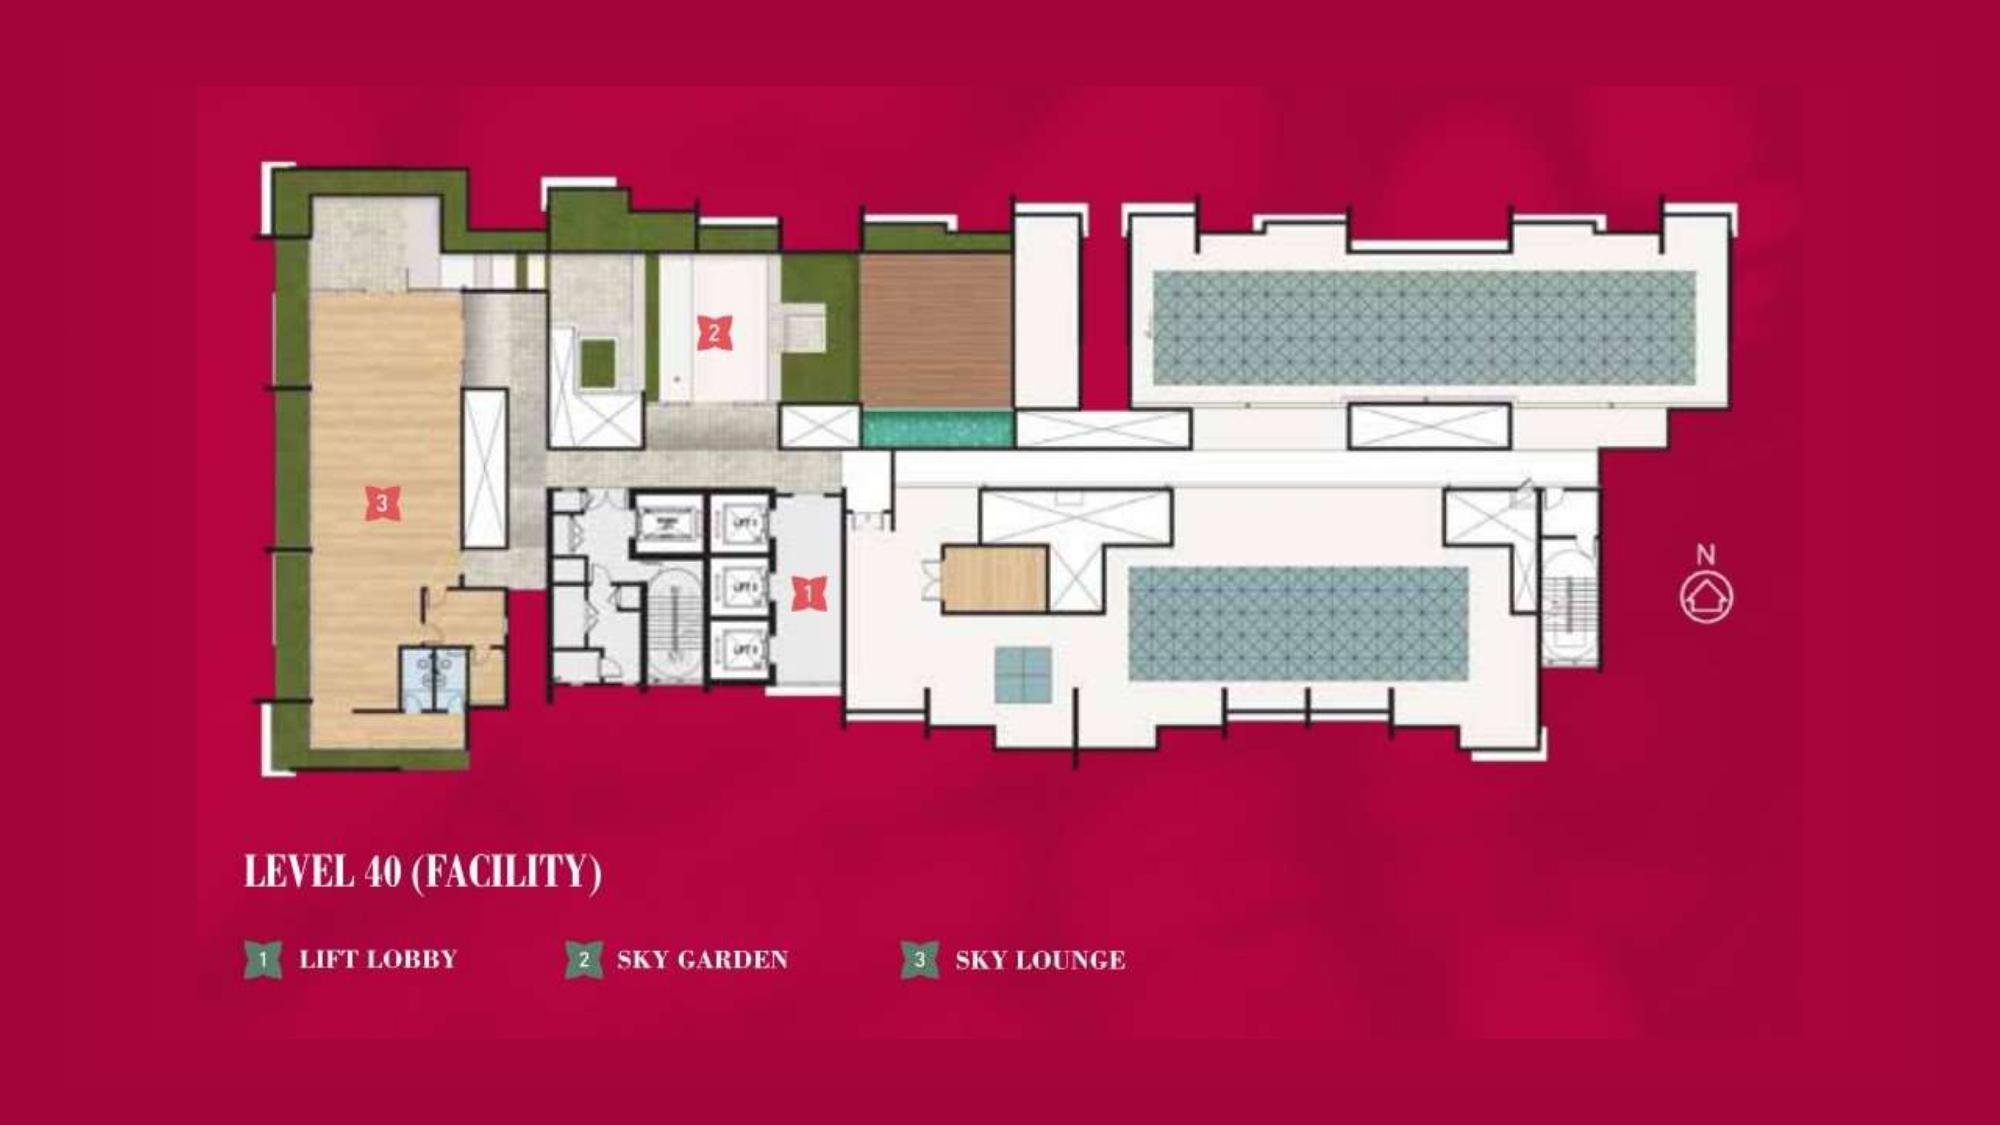 4. Ixora Residence Cheras_Facilities_Level 40